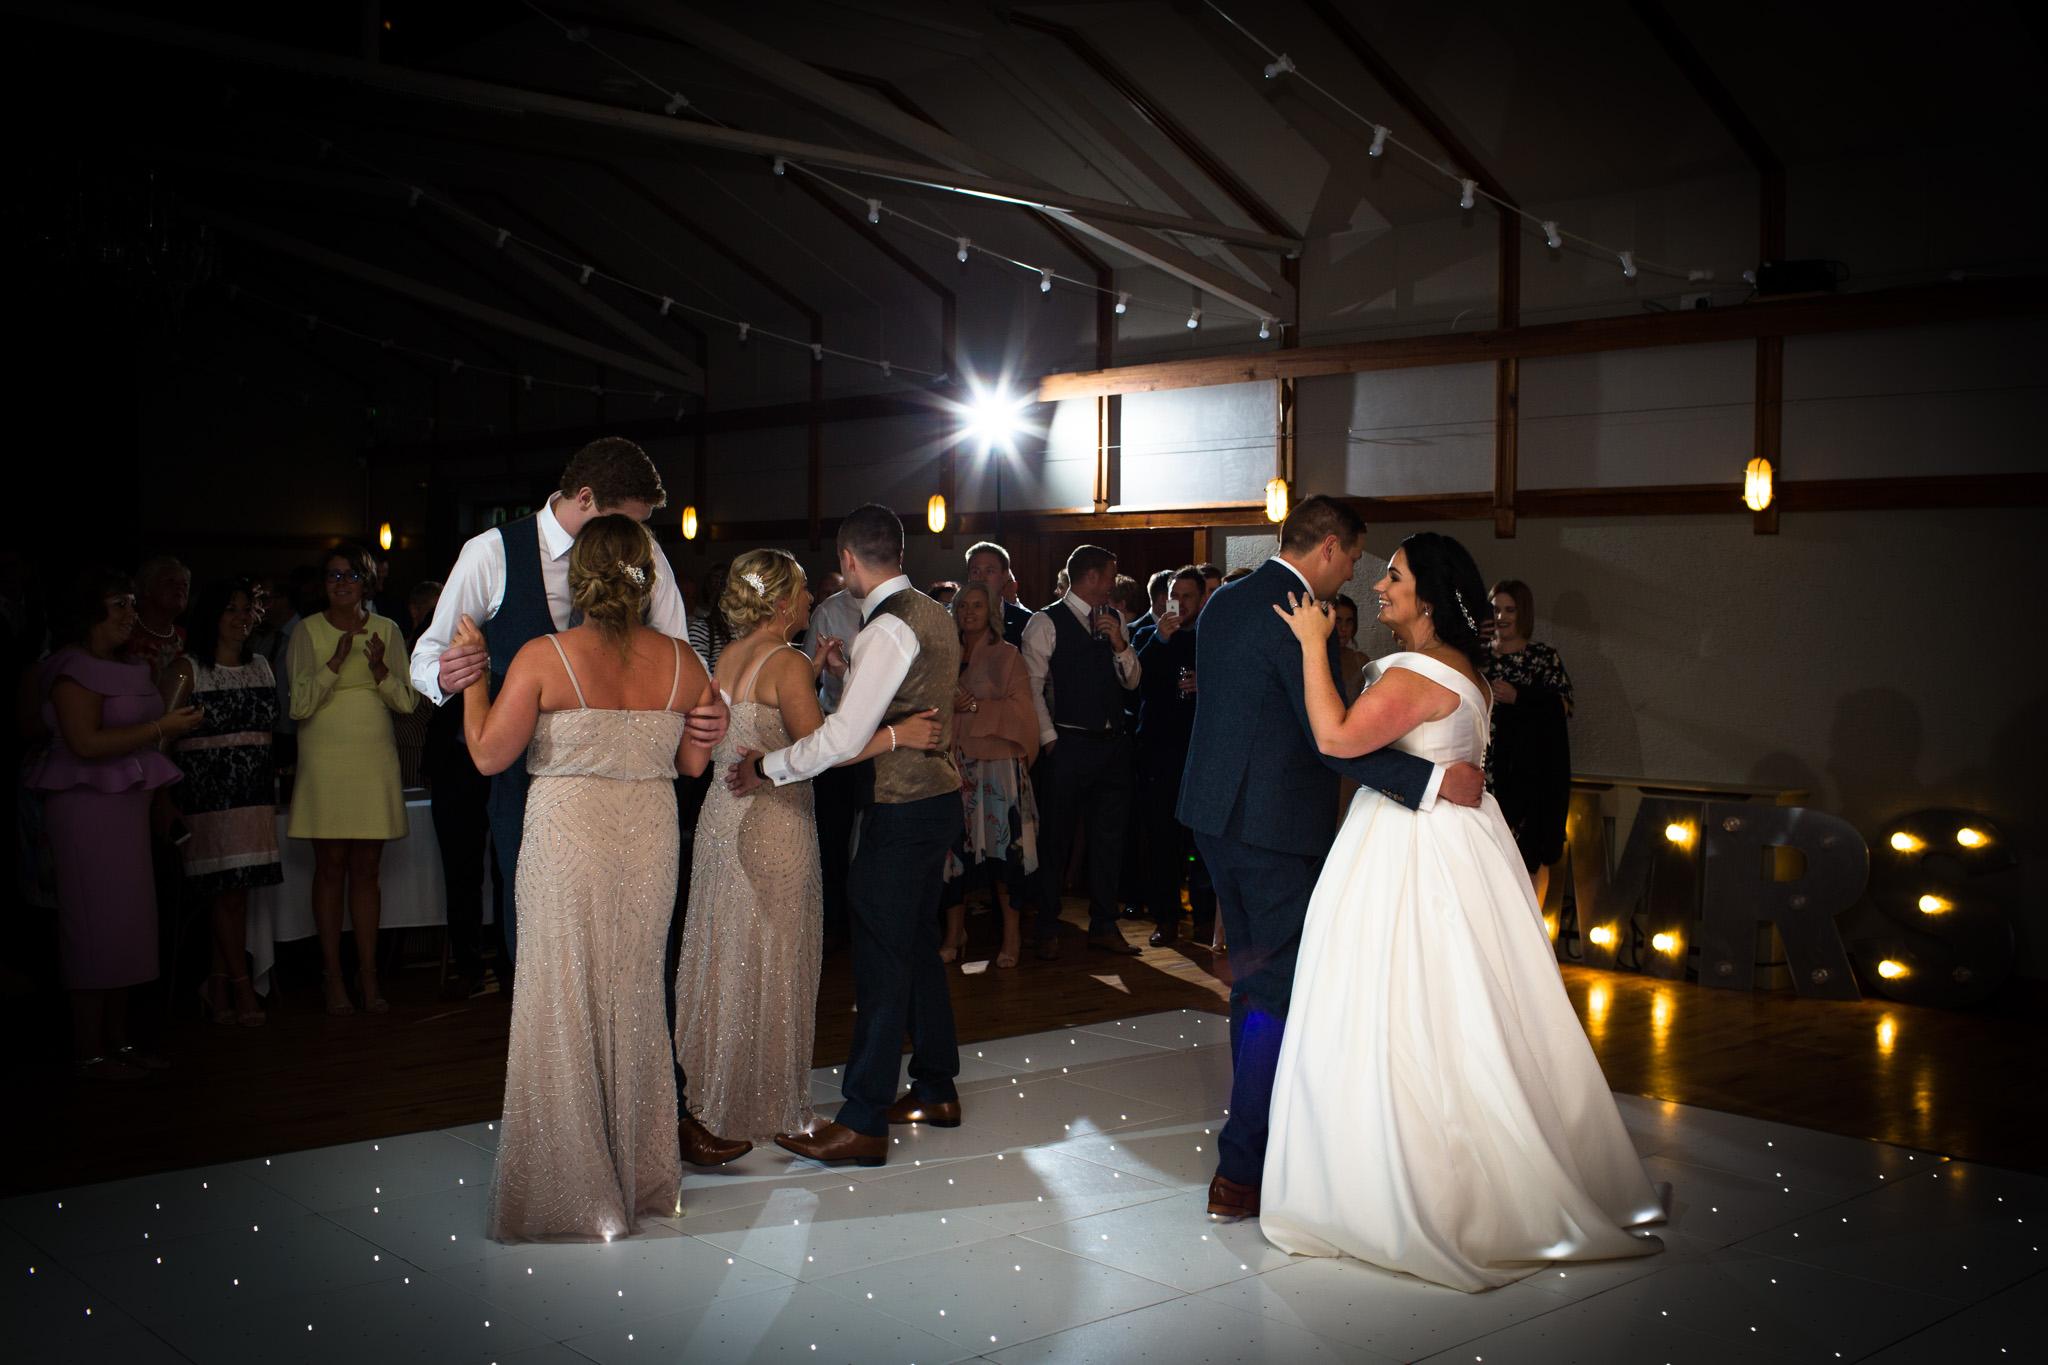 Mark_Barnes_Northern_Ireland_Wedding_Photography_Lusty_Beg_Wedding_Photography_Hayley&Brian-44.jpg